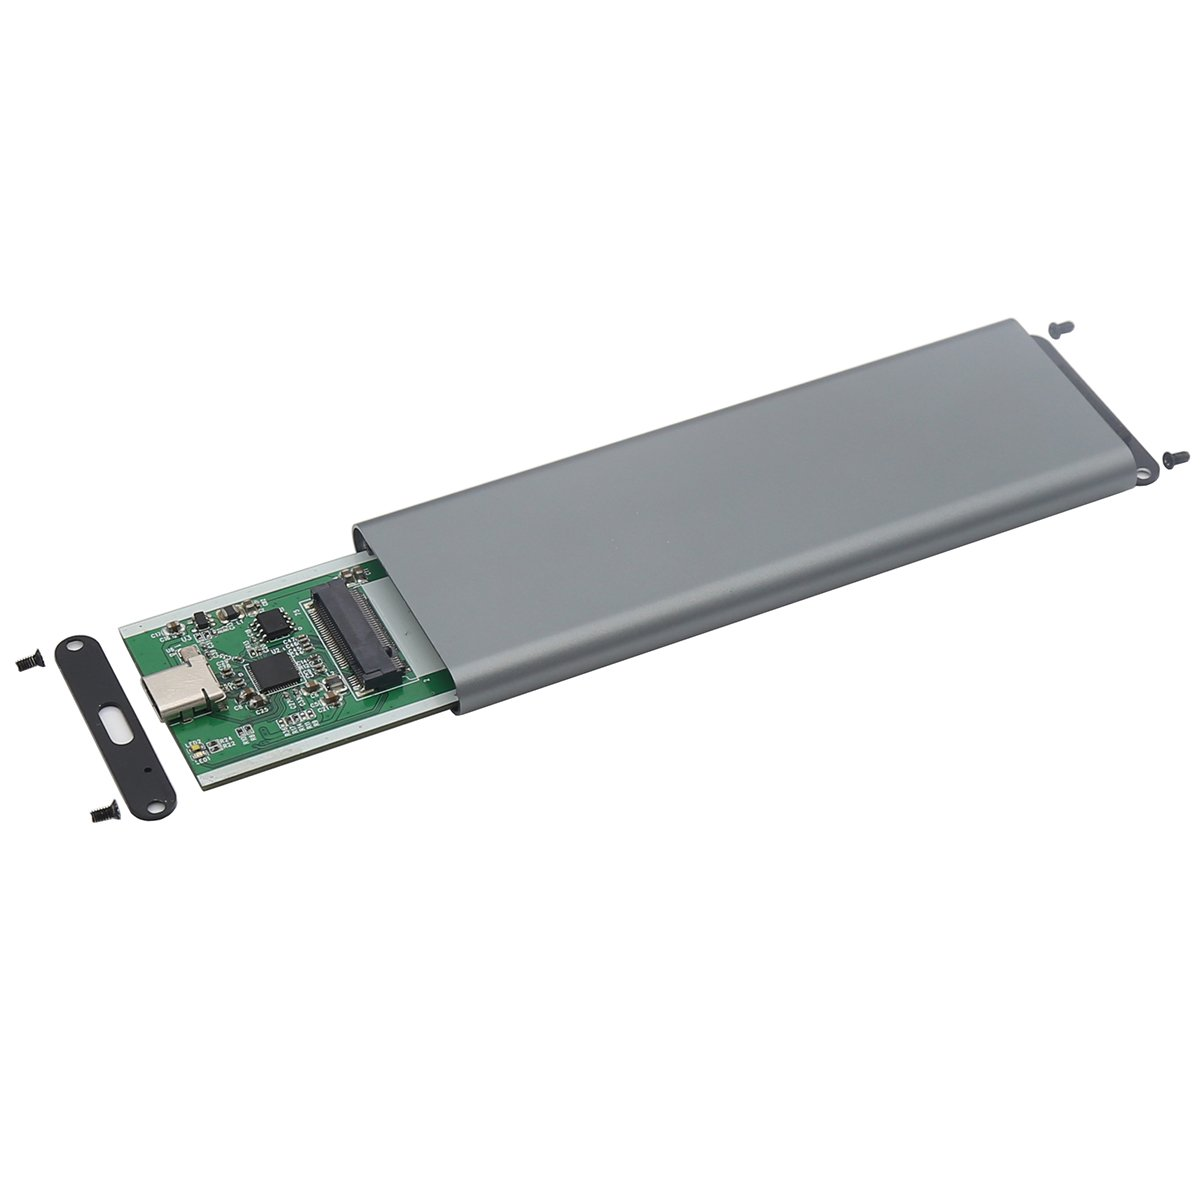 Aluminum M.2 NGFF to USB 3.1 M.2 SSD Enclosure External SSD Enclosure SATA Based M.2(Grey) by Generic (Image #4)